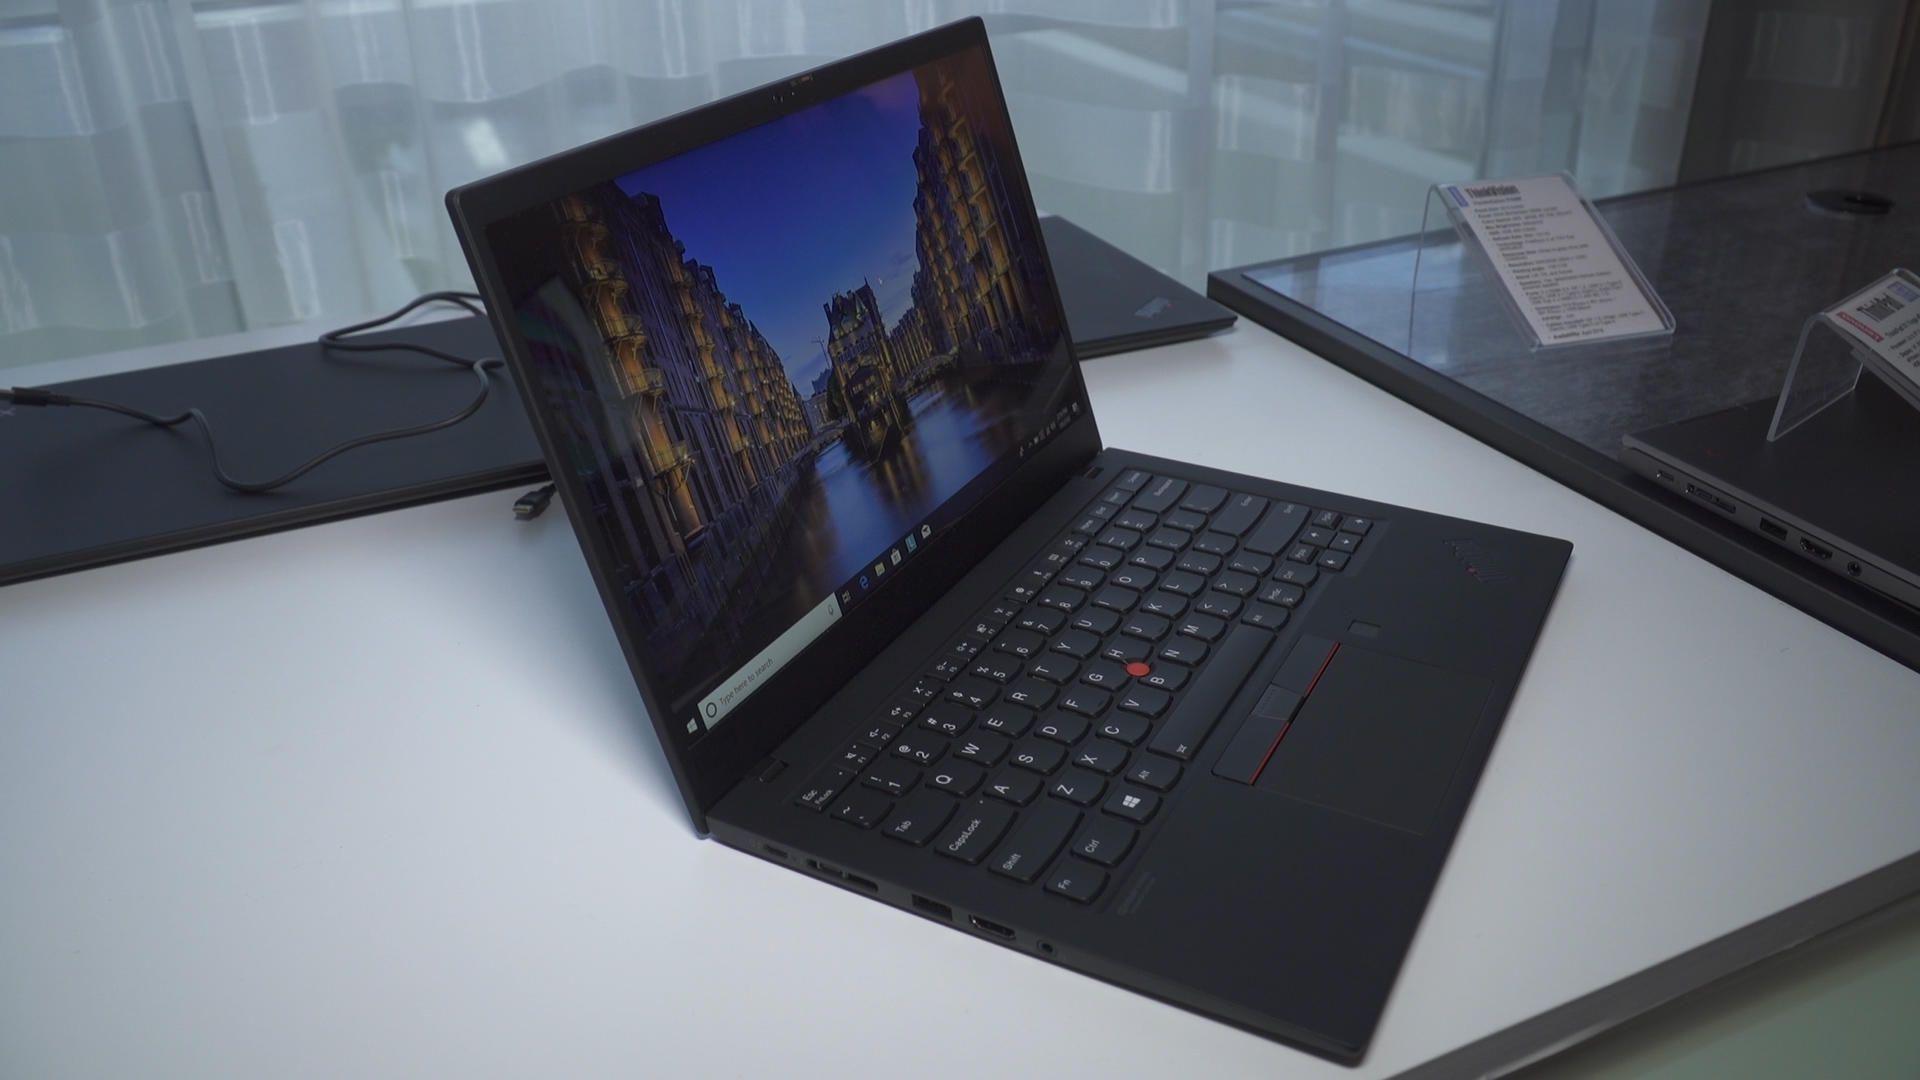 Lenovo ThinkPad Wallpapers - Top Free Lenovo ThinkPad Backgrounds